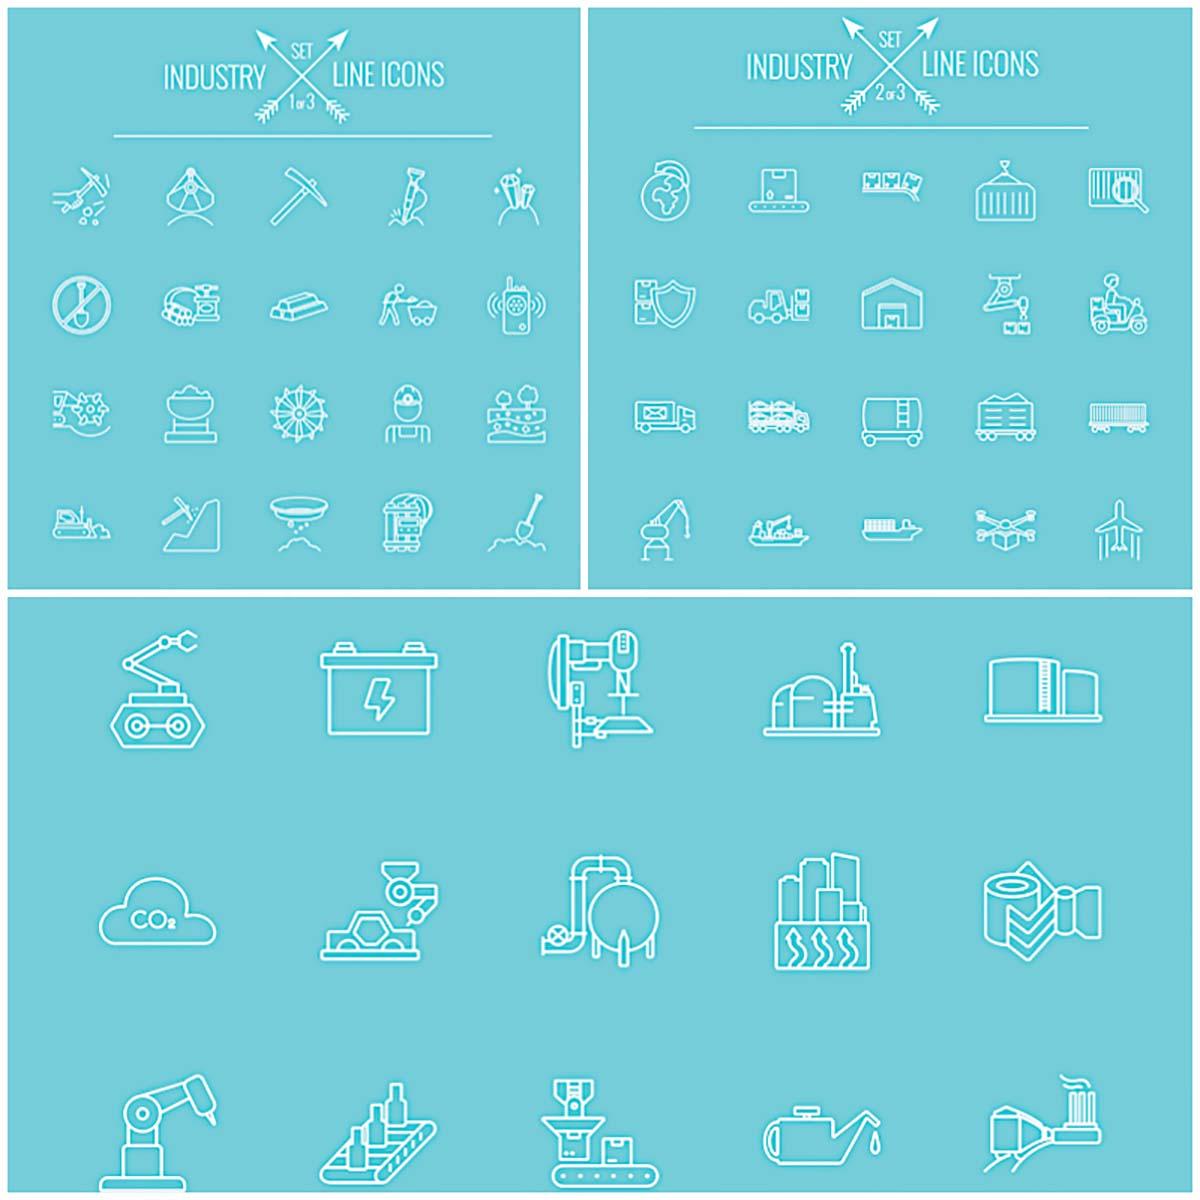 Industry line icon set of vectors